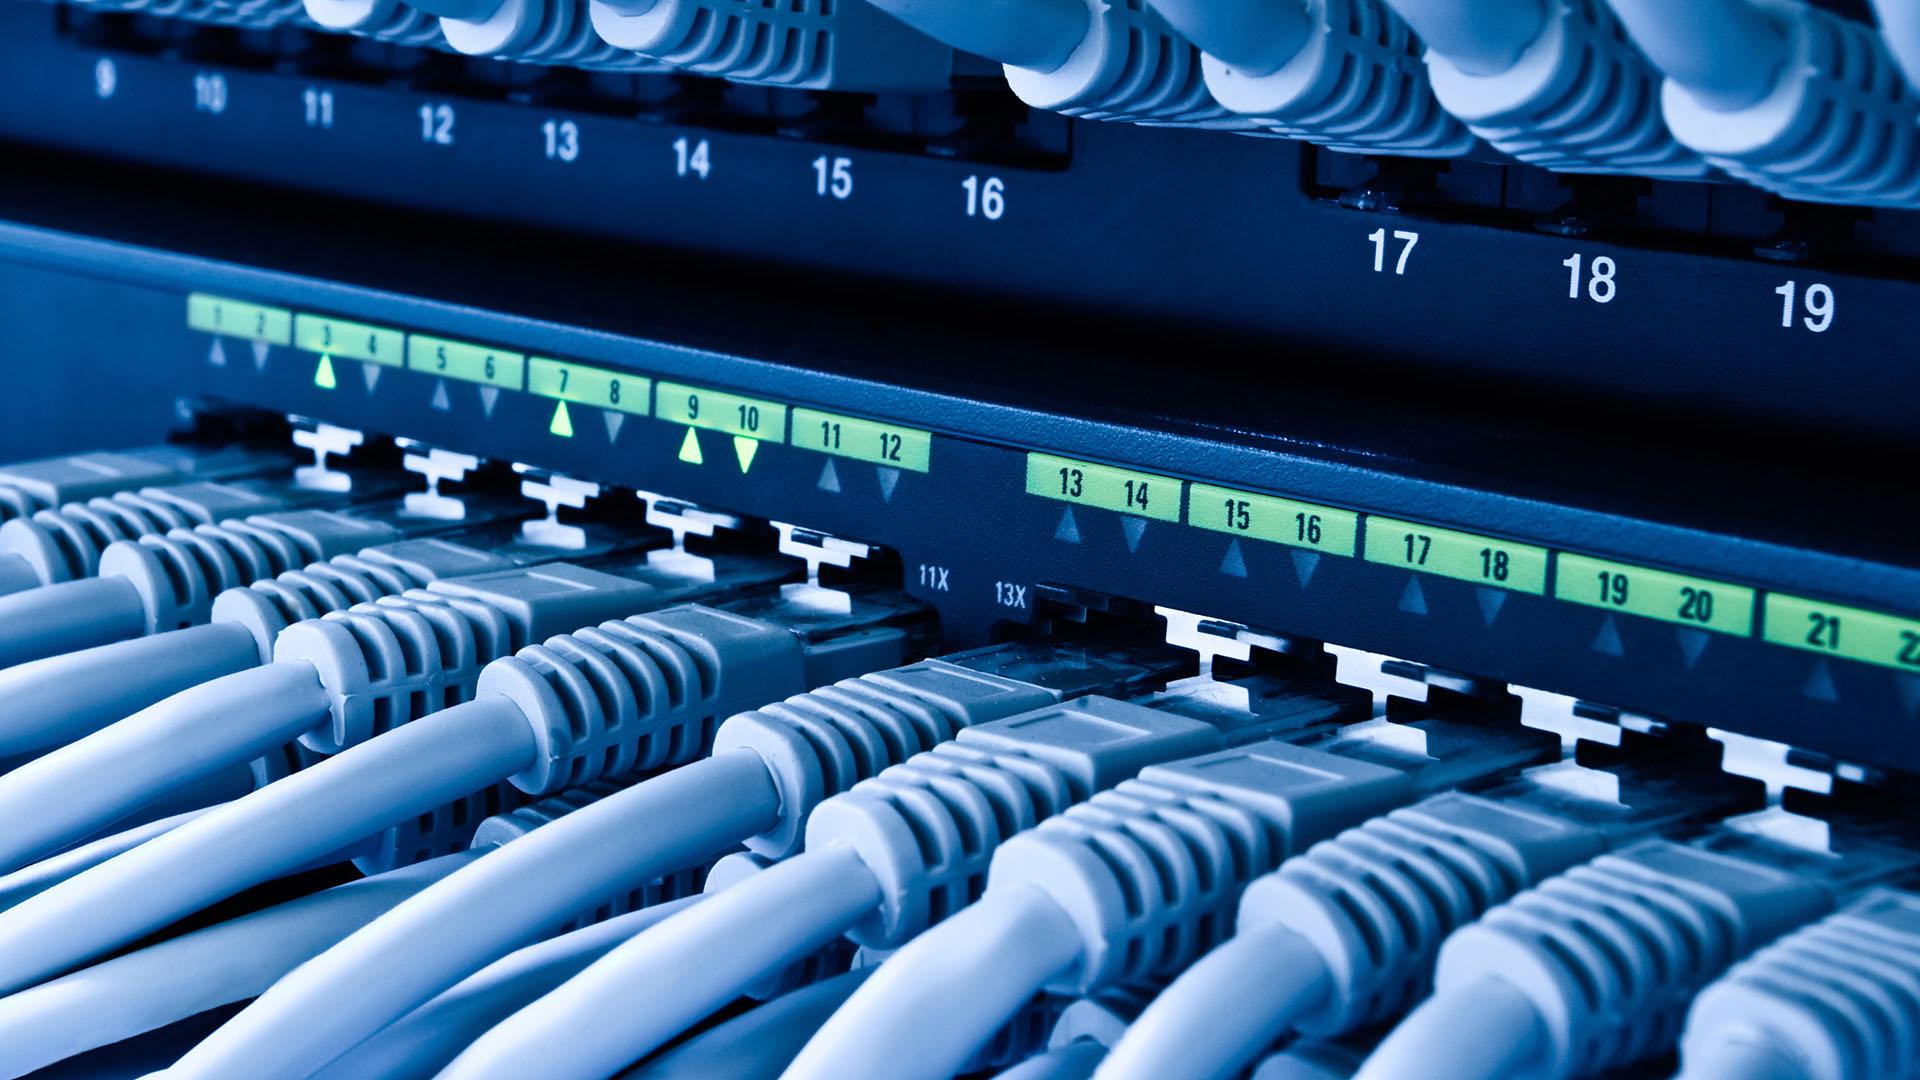 London Kentucky Premier Voice & Data Network Cabling Provider